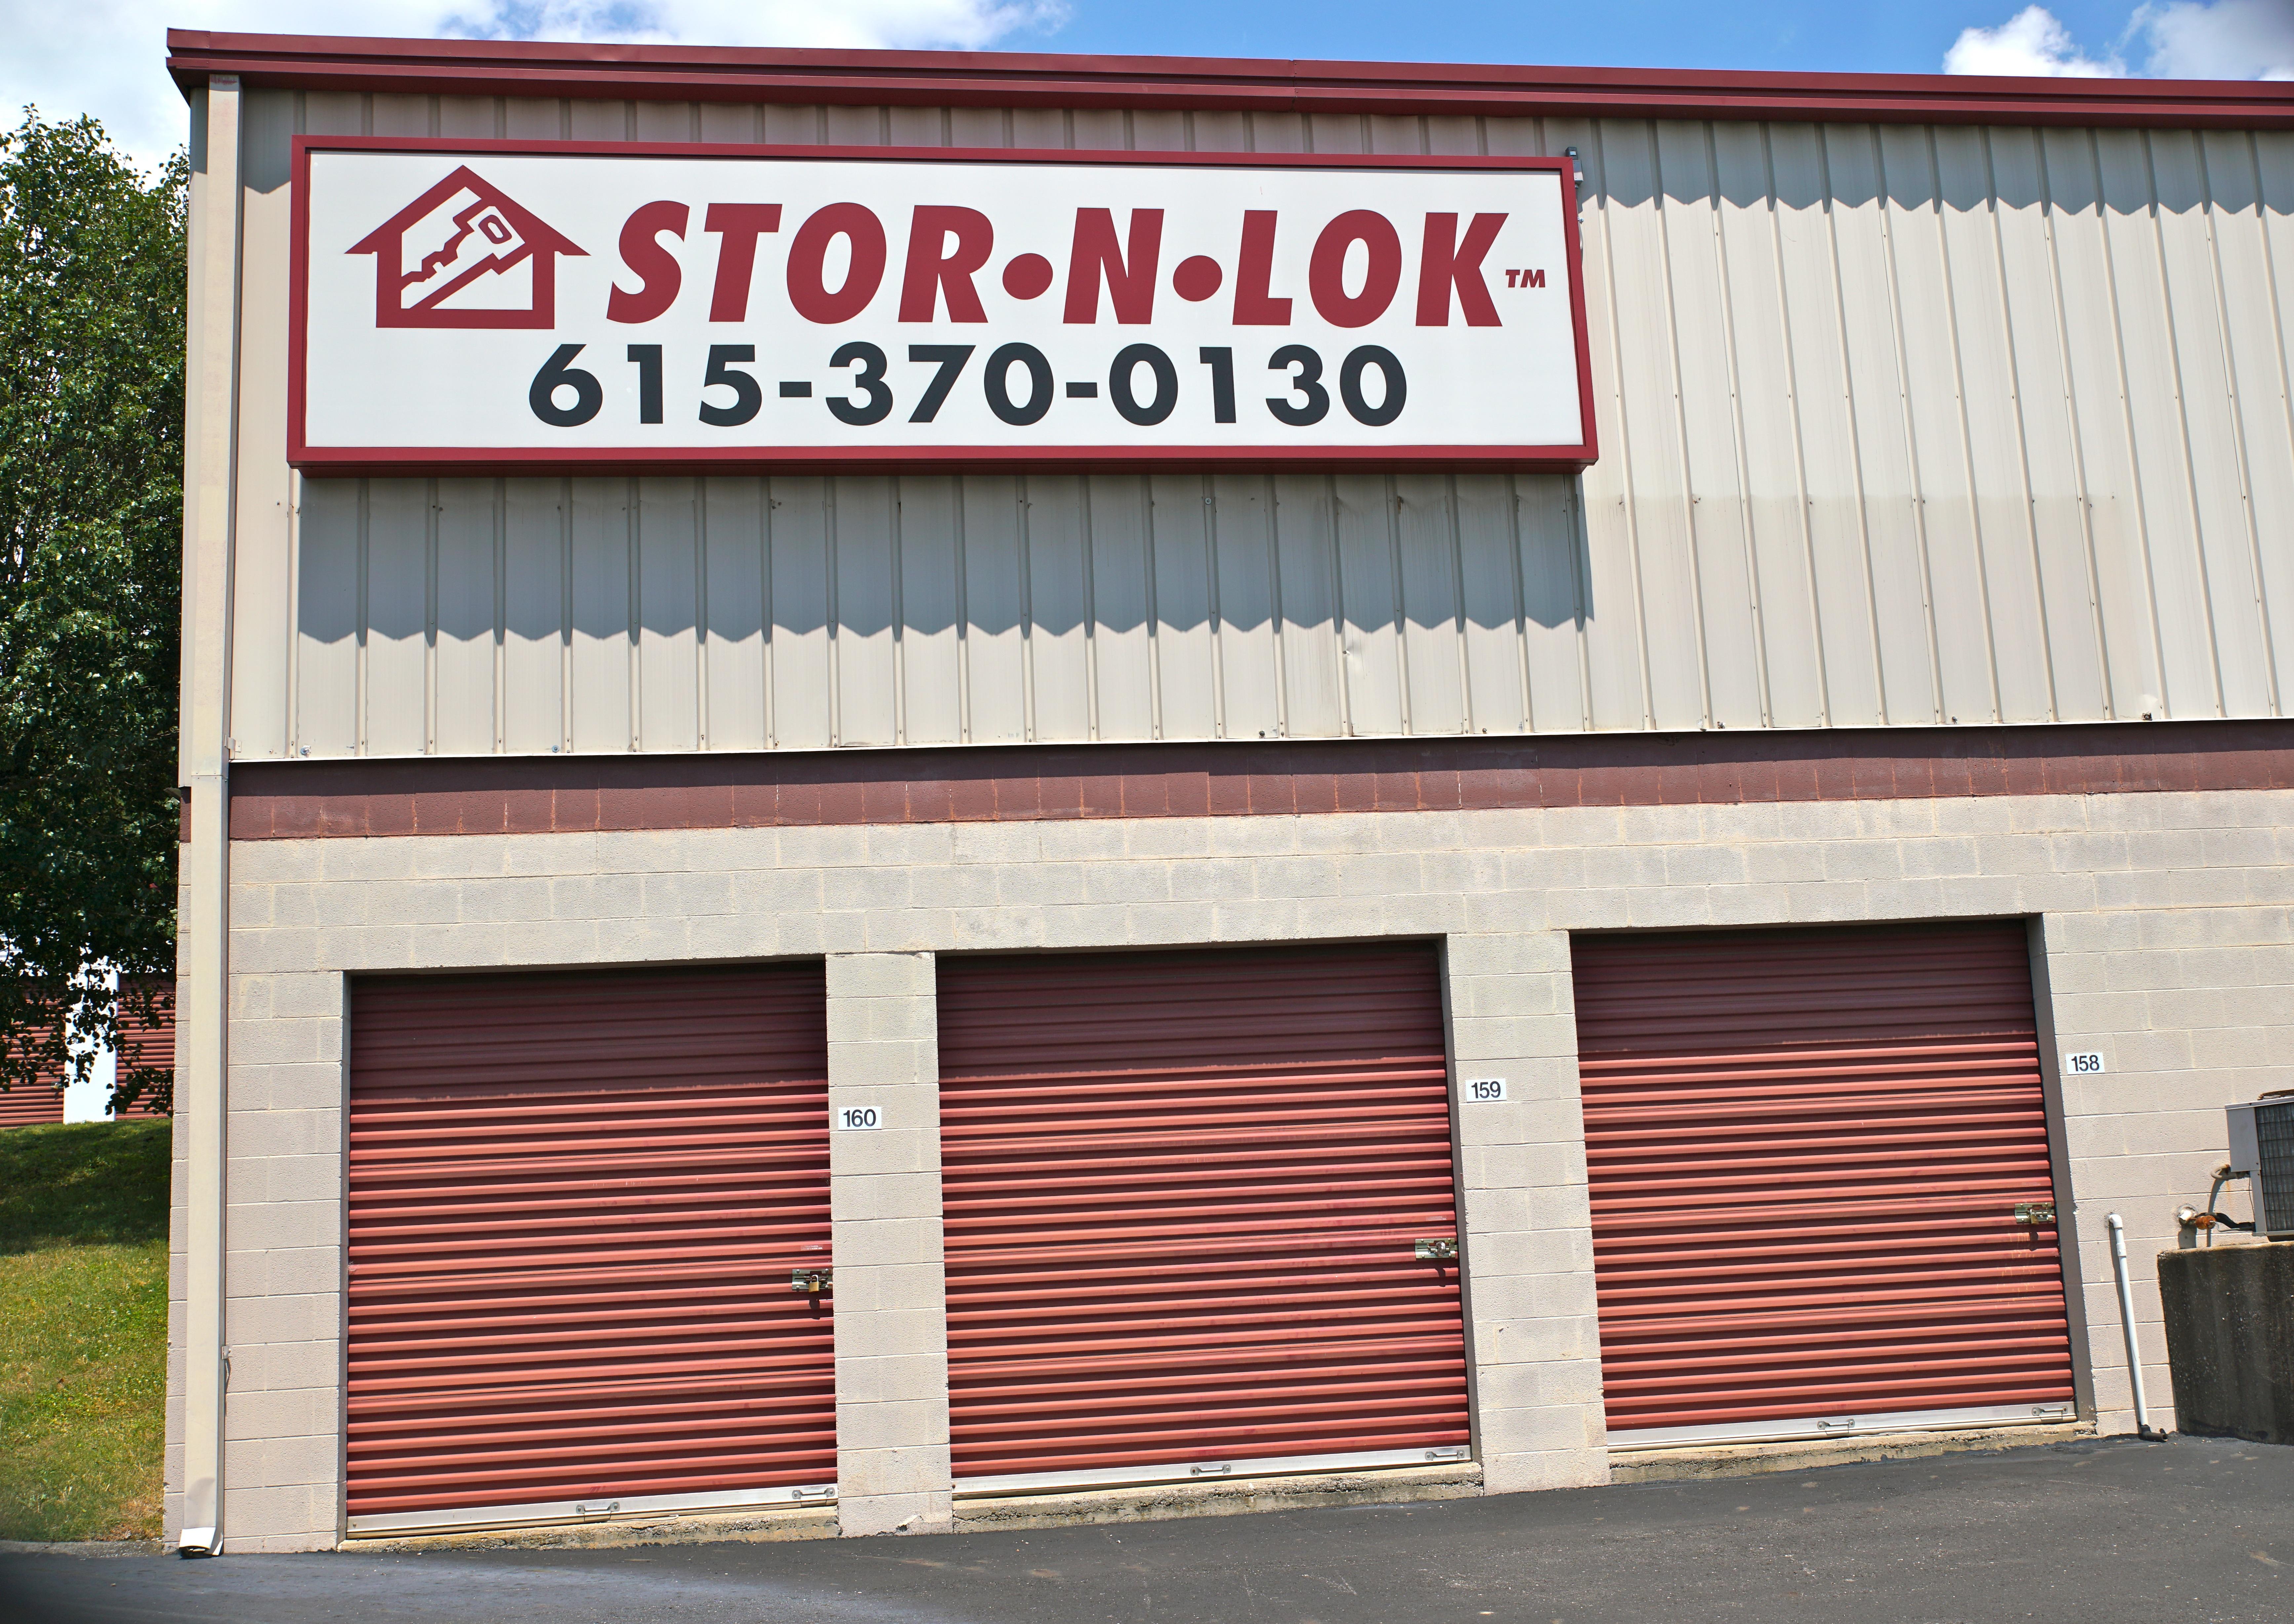 Brentwood Stor-N-Lok